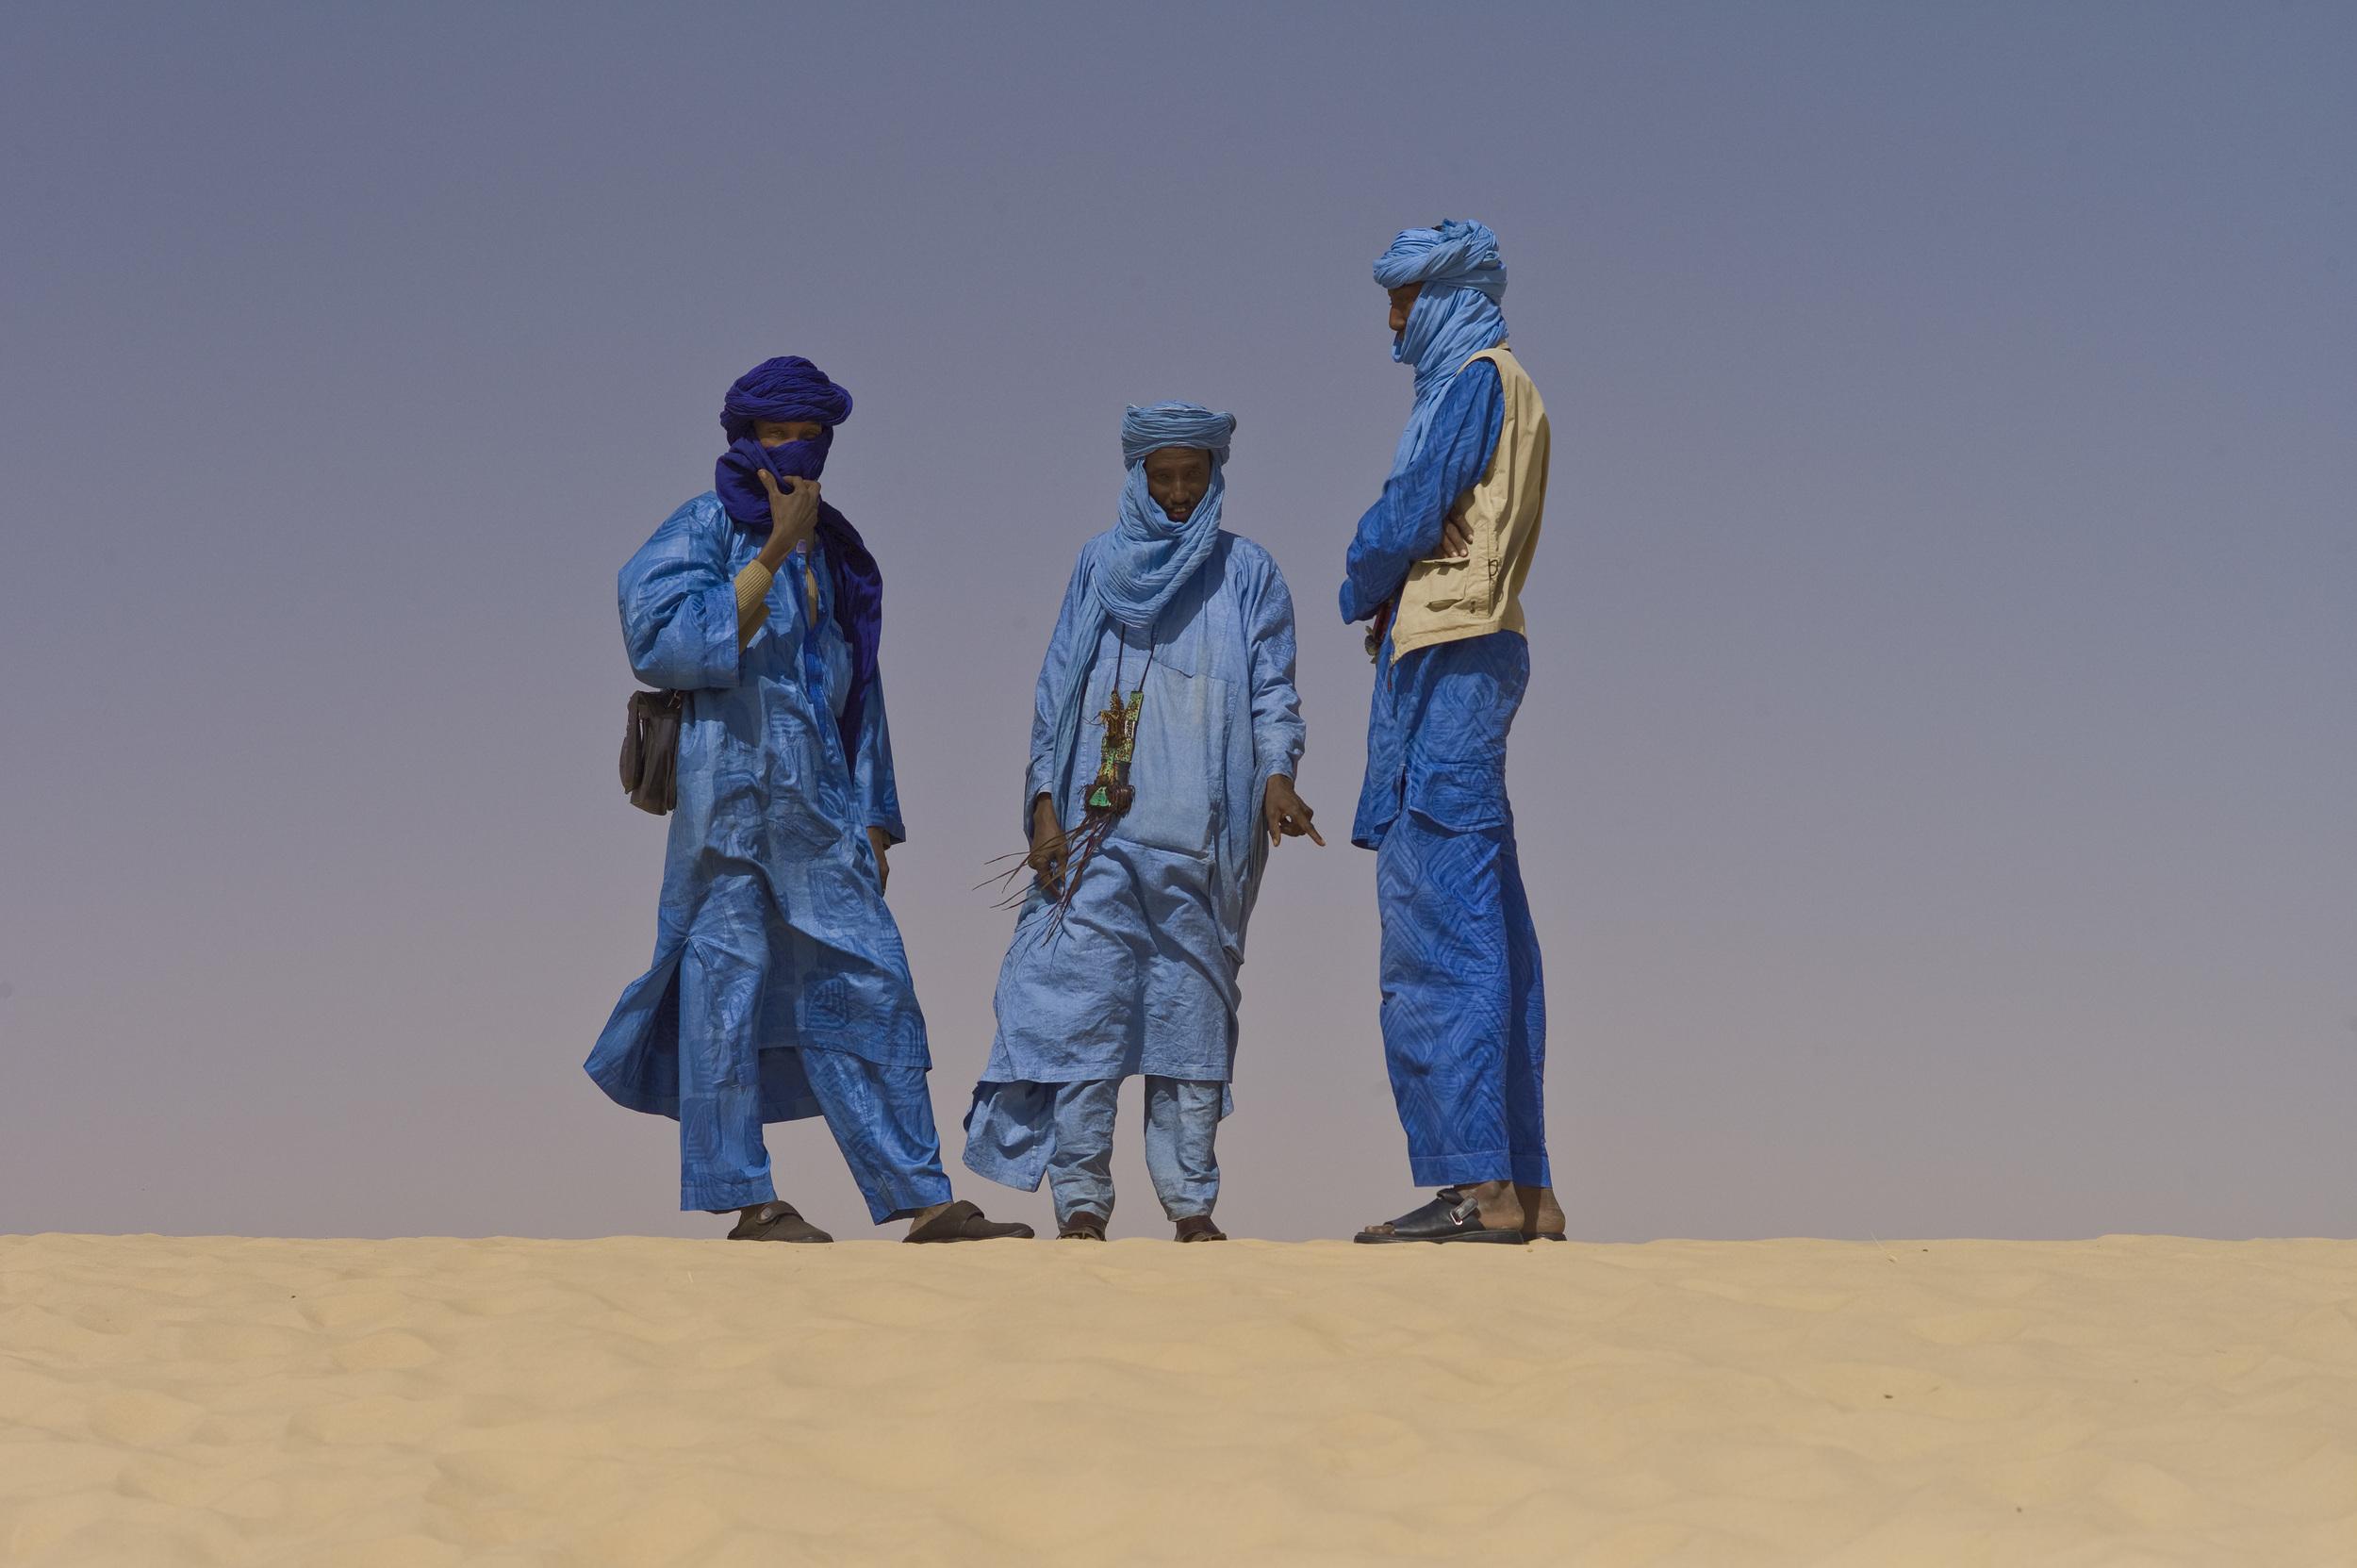 Touaregs_at_the_Festival_au_Desert_near_Timbuktu,_Mali_2012.jpg